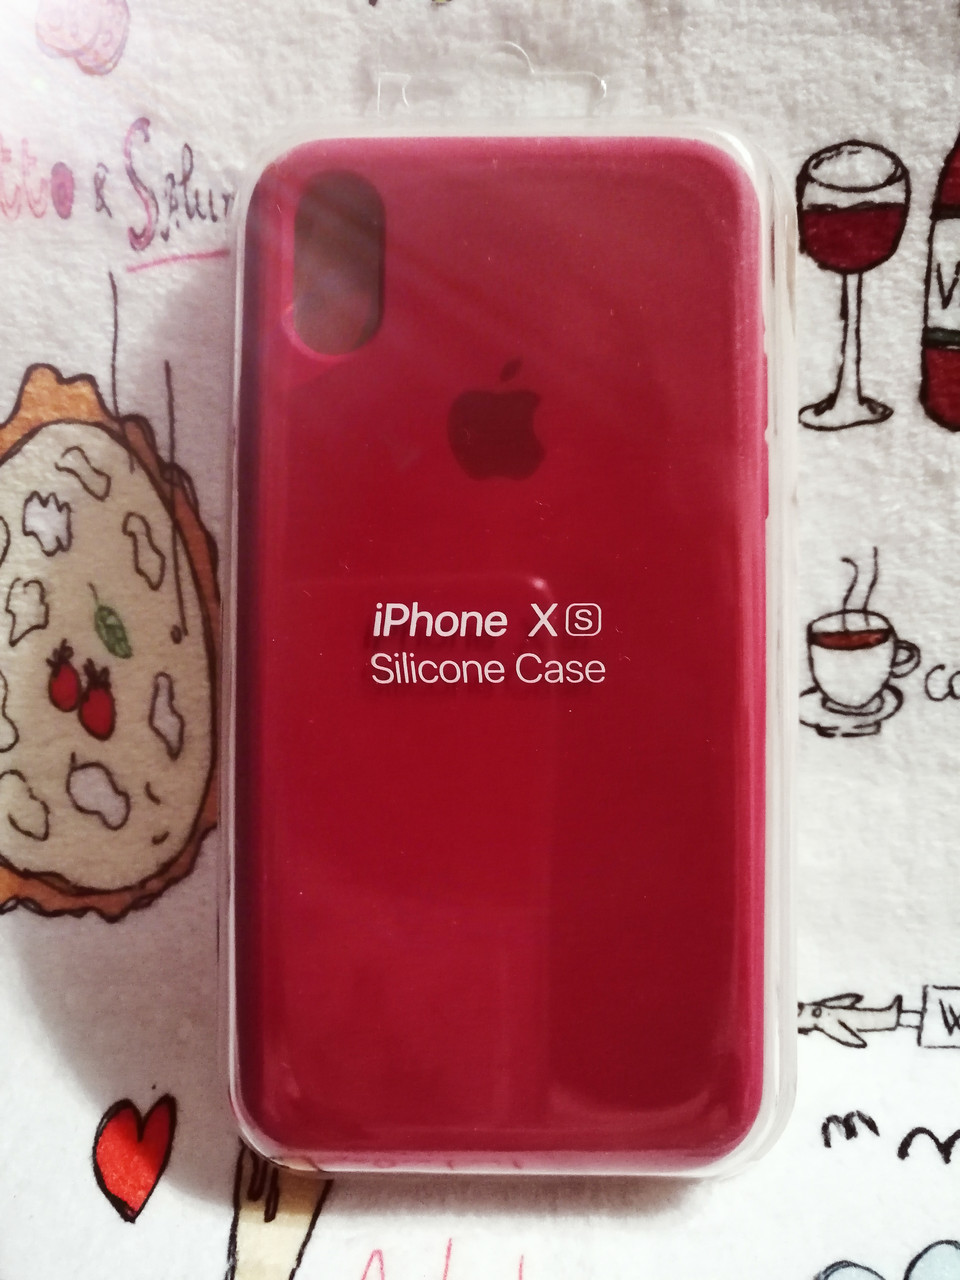 Чехол iPhone X / Xs Soft Touch Silicone Case с микрофиброй внутри (MKX32FE) - Color 15